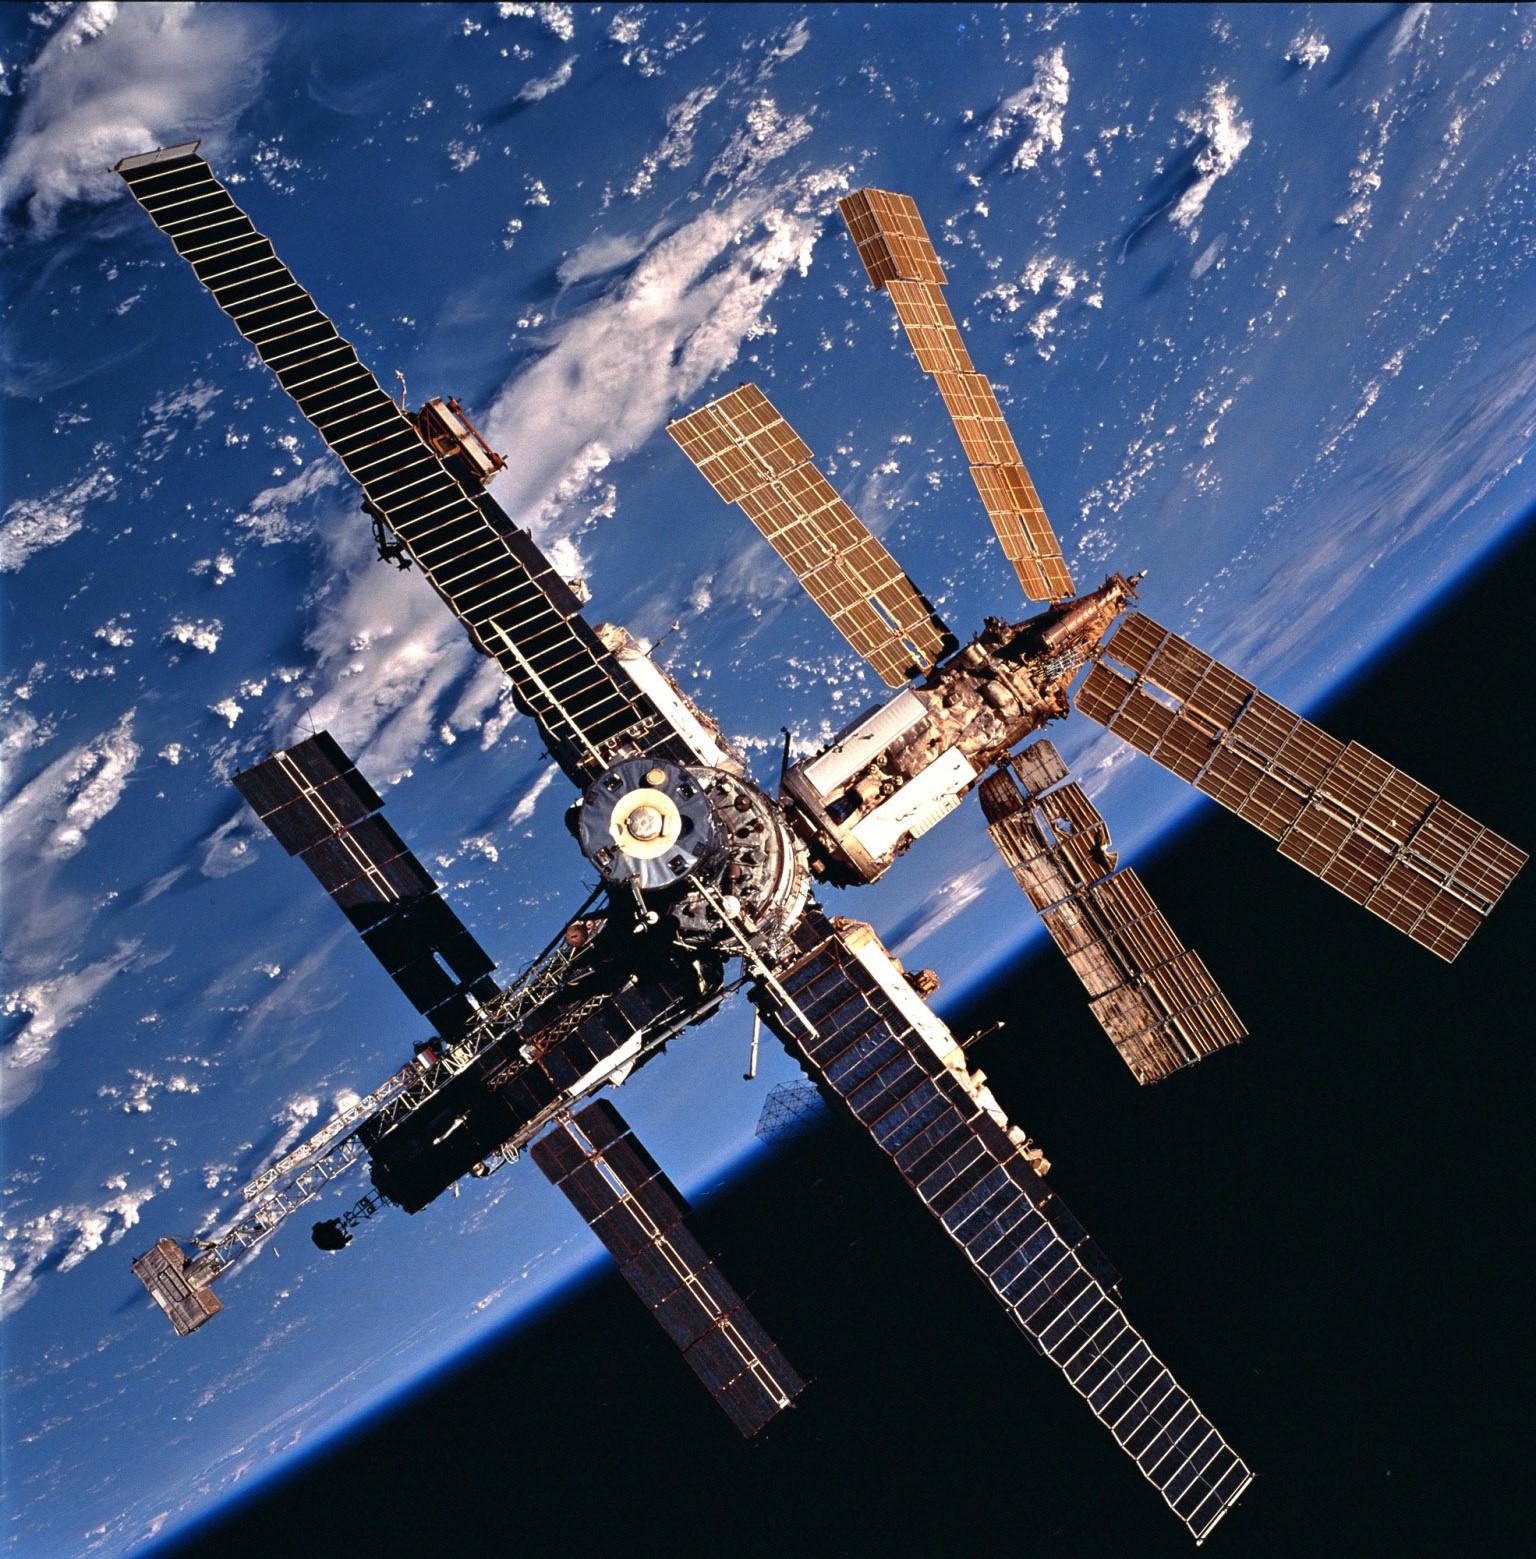 Soviet's Mir space station in 1986. - Image Credit: NASA/wikimedia